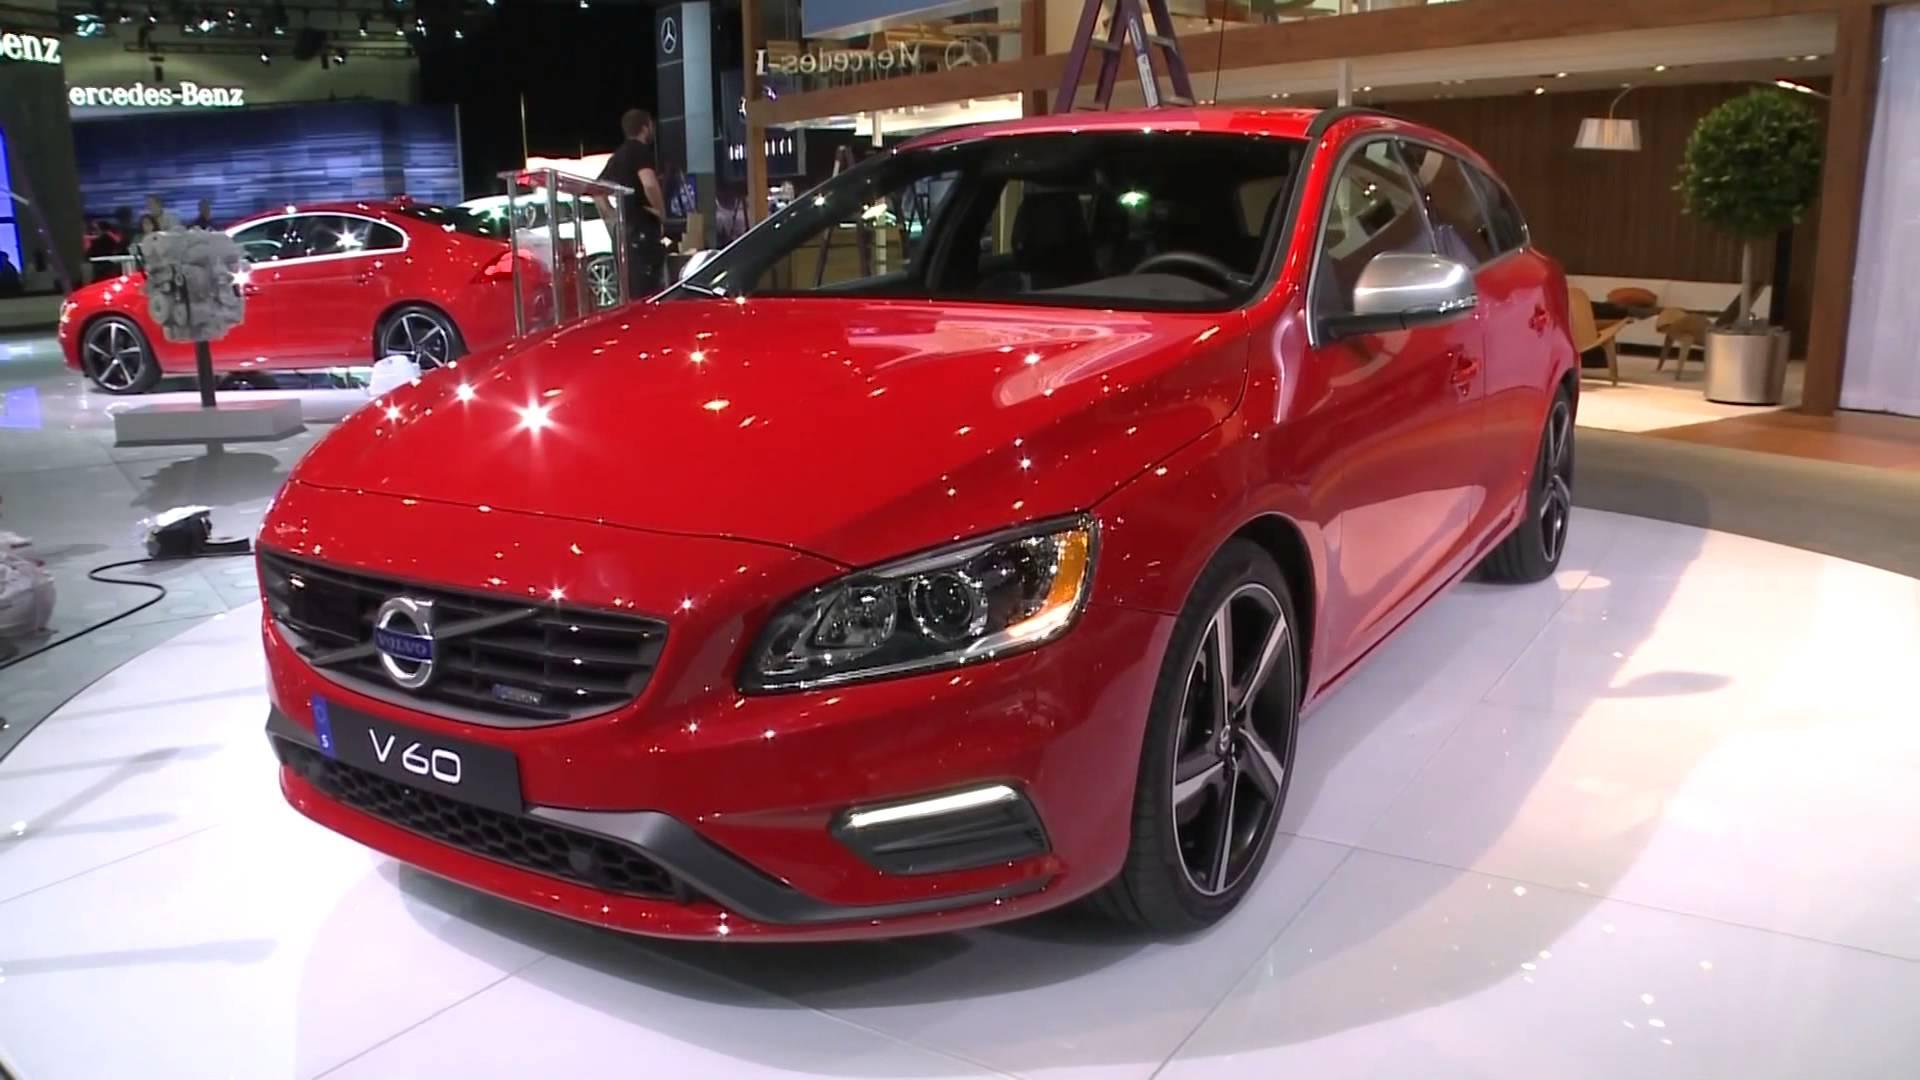 MORE COOL CARS FROM THE 2013 LA AUTO SHOWnbsp